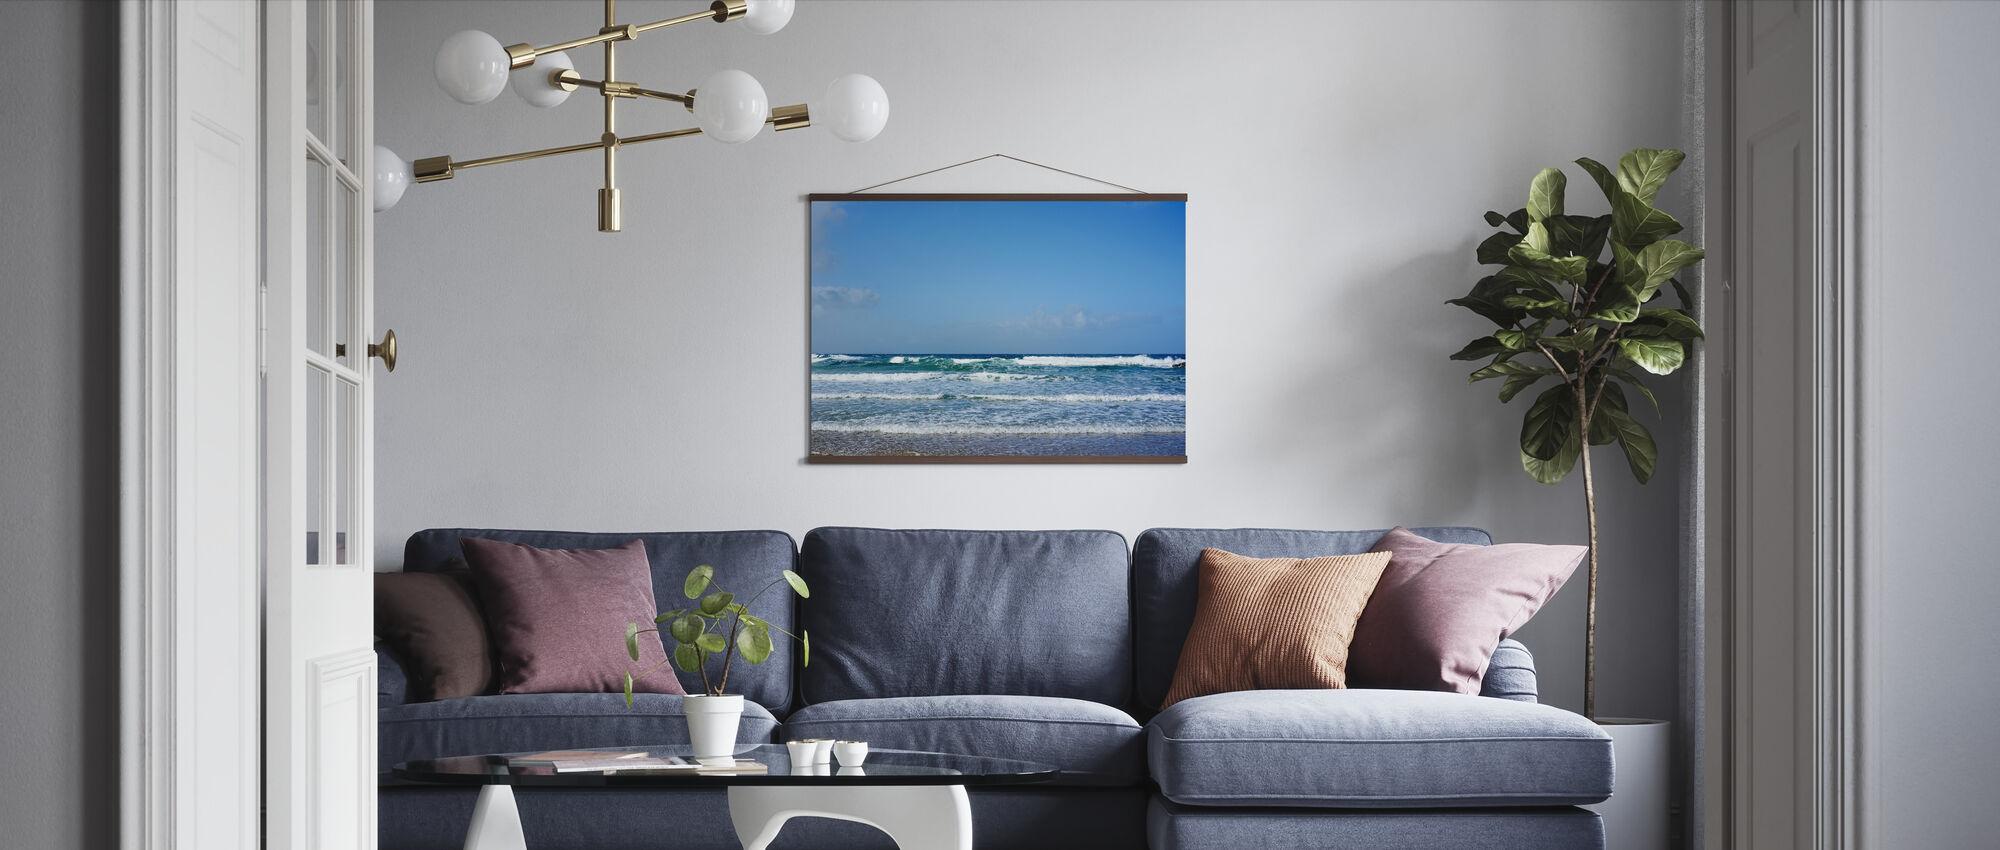 Mjuka Atlantvågor - Poster - Vardagsrum